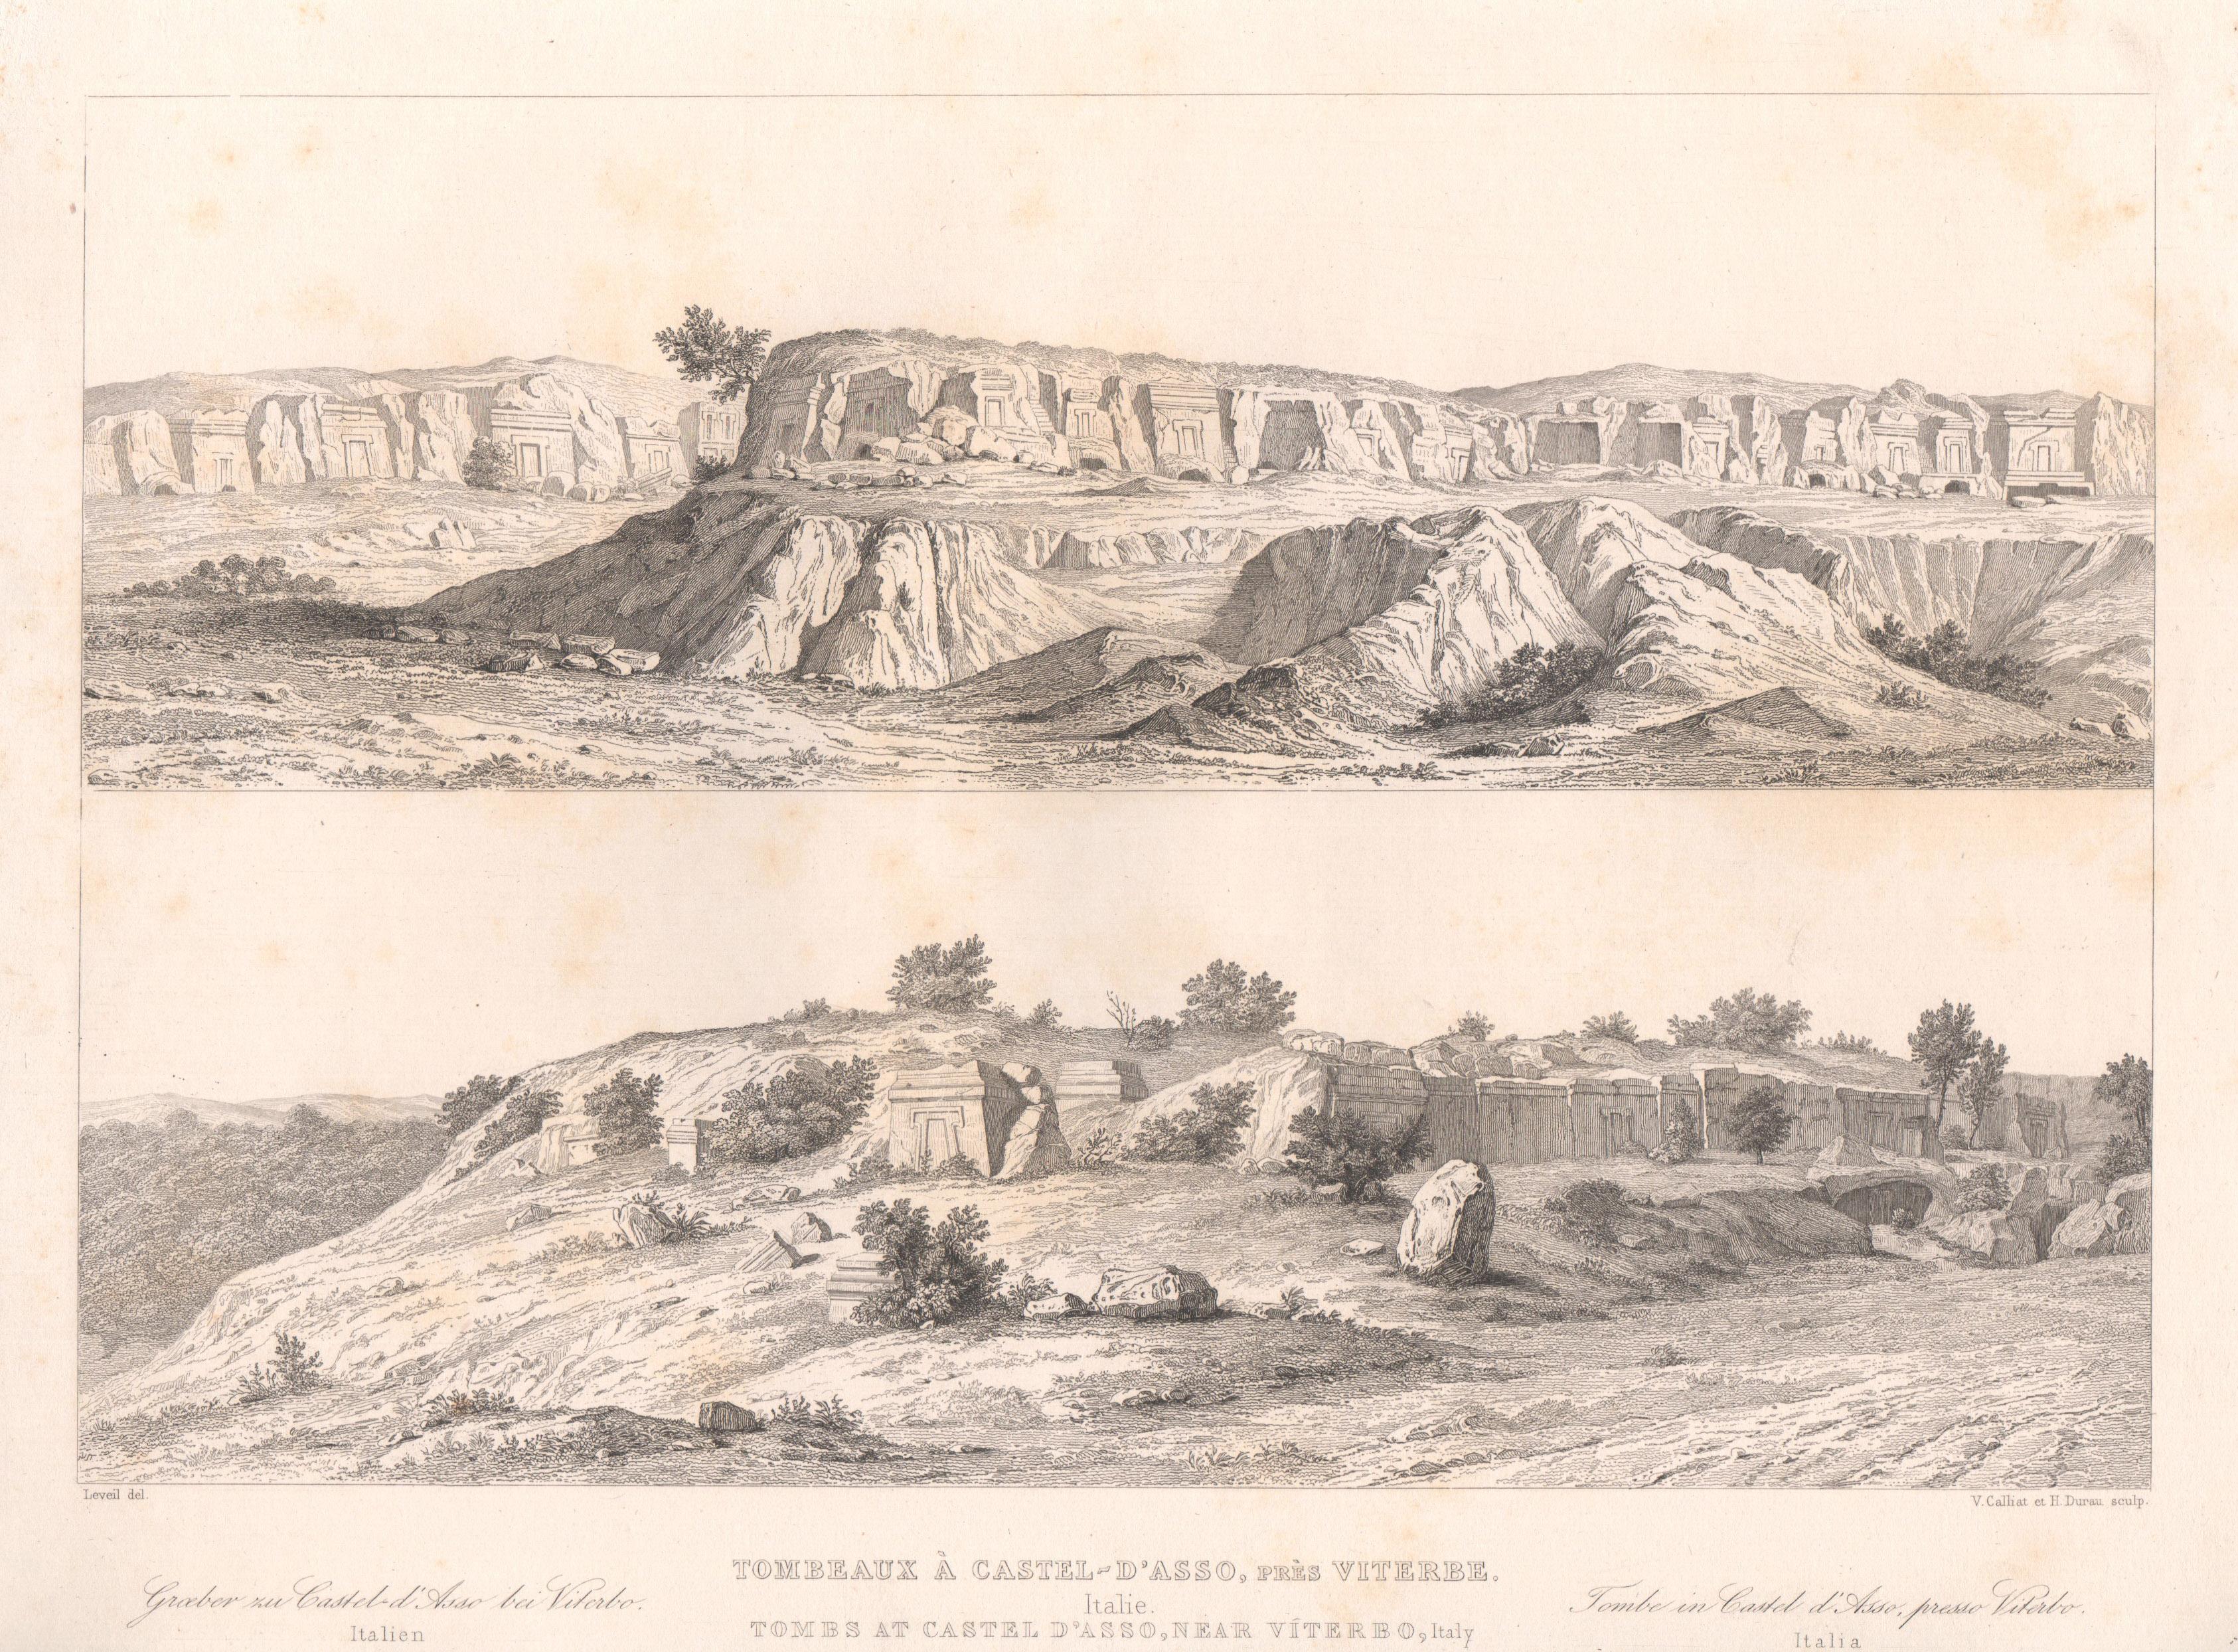 Italy - Antique Monuments - Castel d'Asso's Necropolis - Viterbo - Lazio